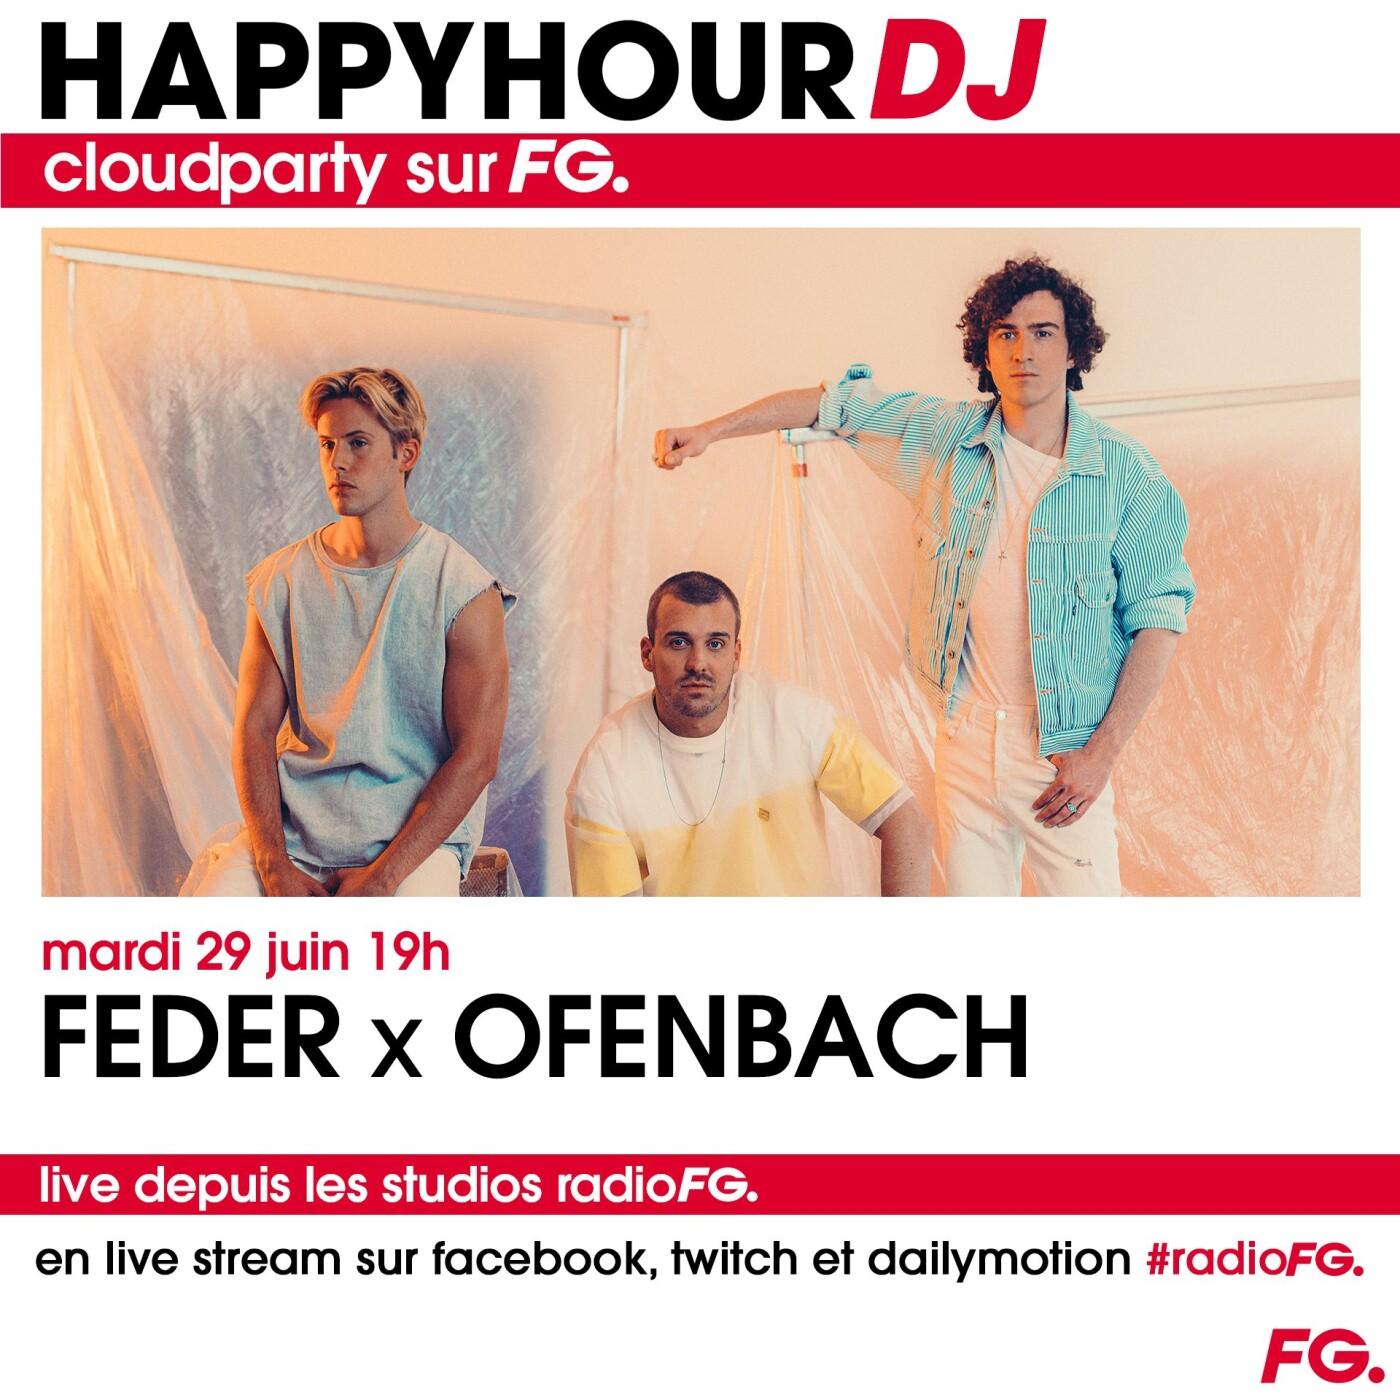 HAPPY HOUR DJ : FEDER X OFENBACH